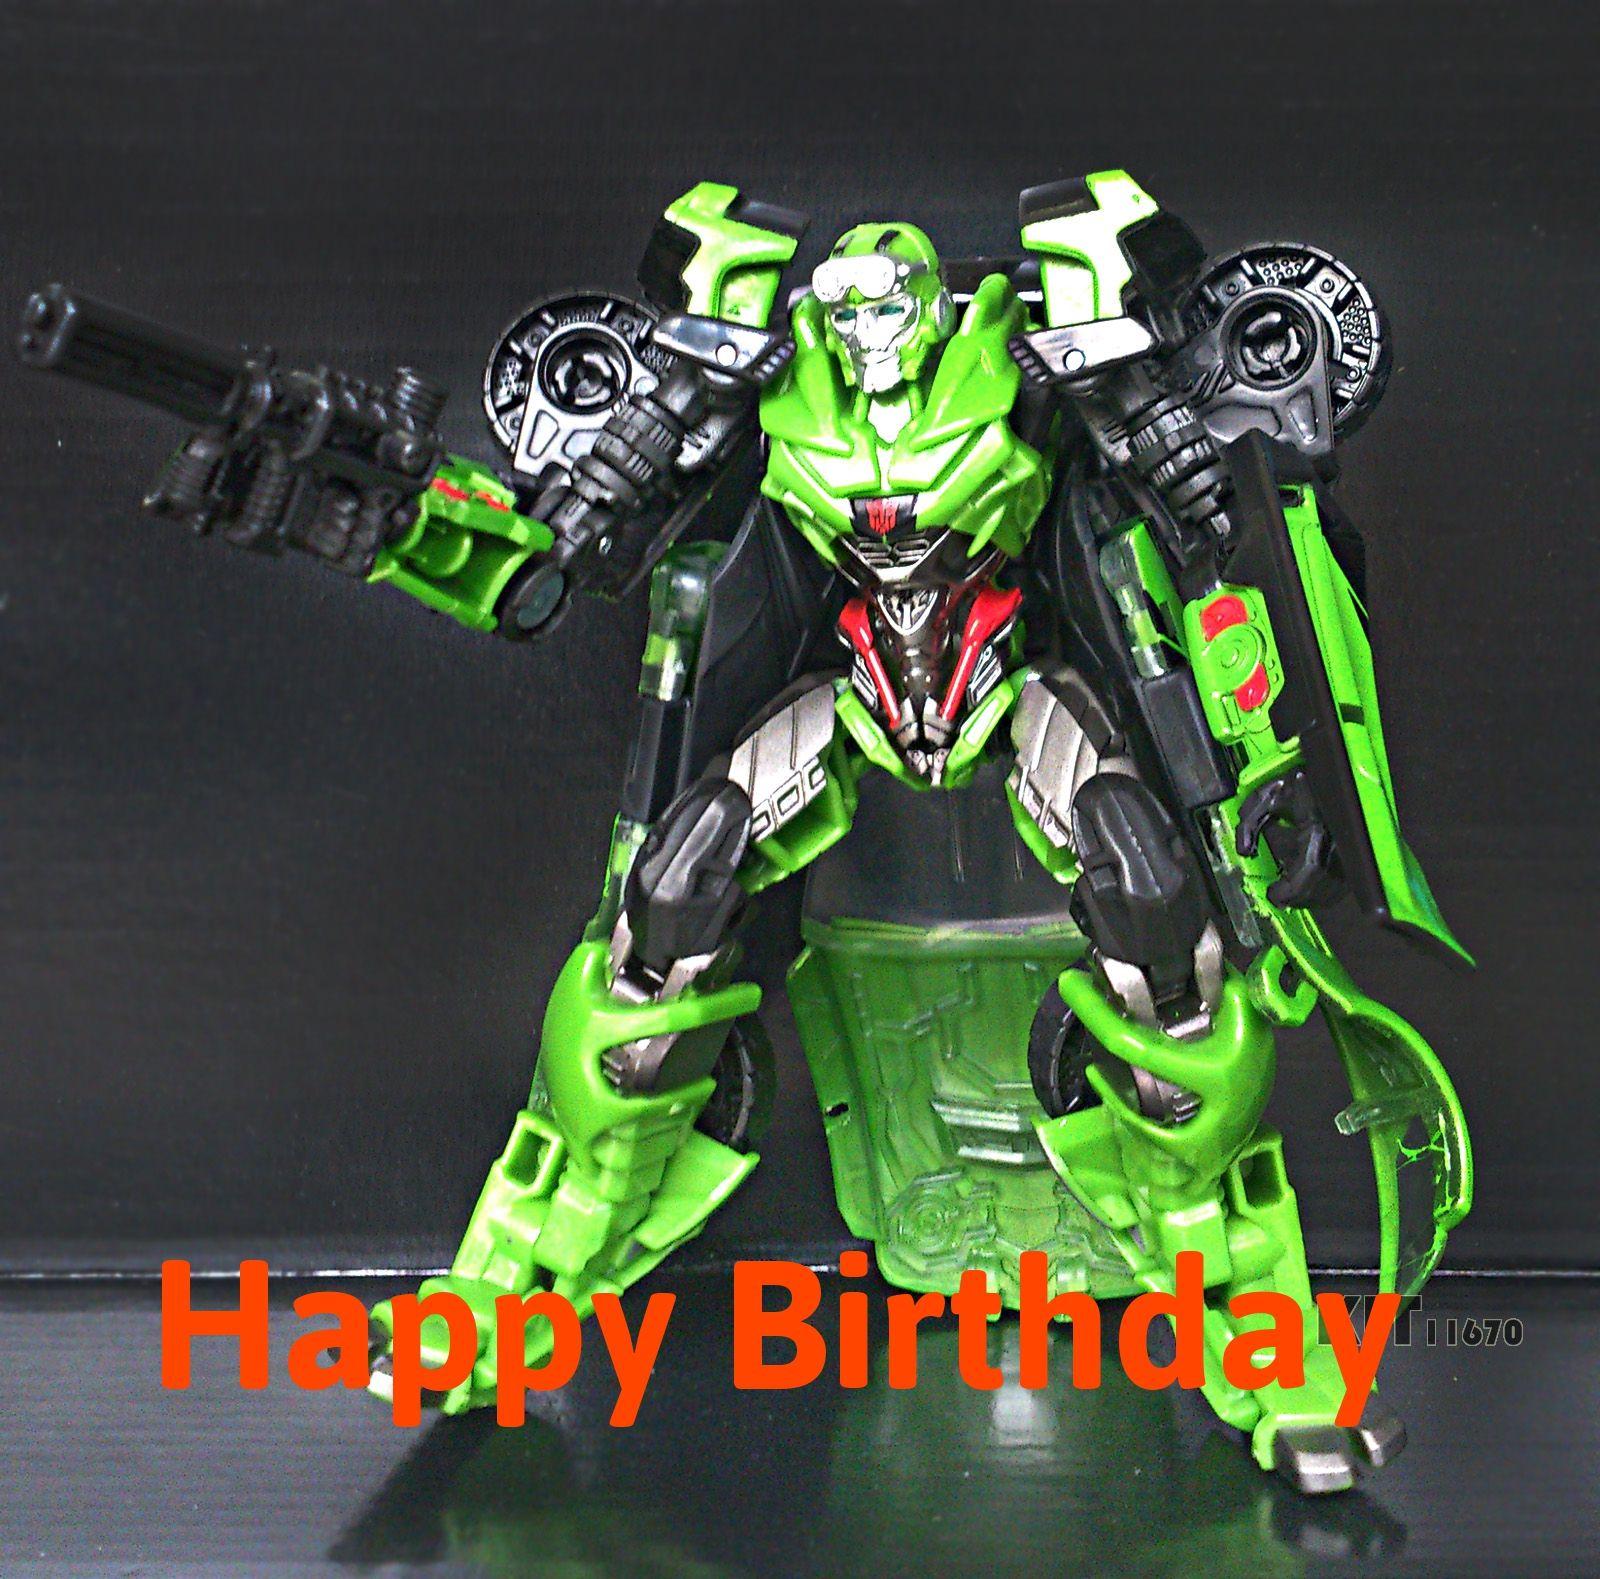 Transformers Birthday Cards Transformer Birthday Birthday Greeting Cards Greeting Card Collection